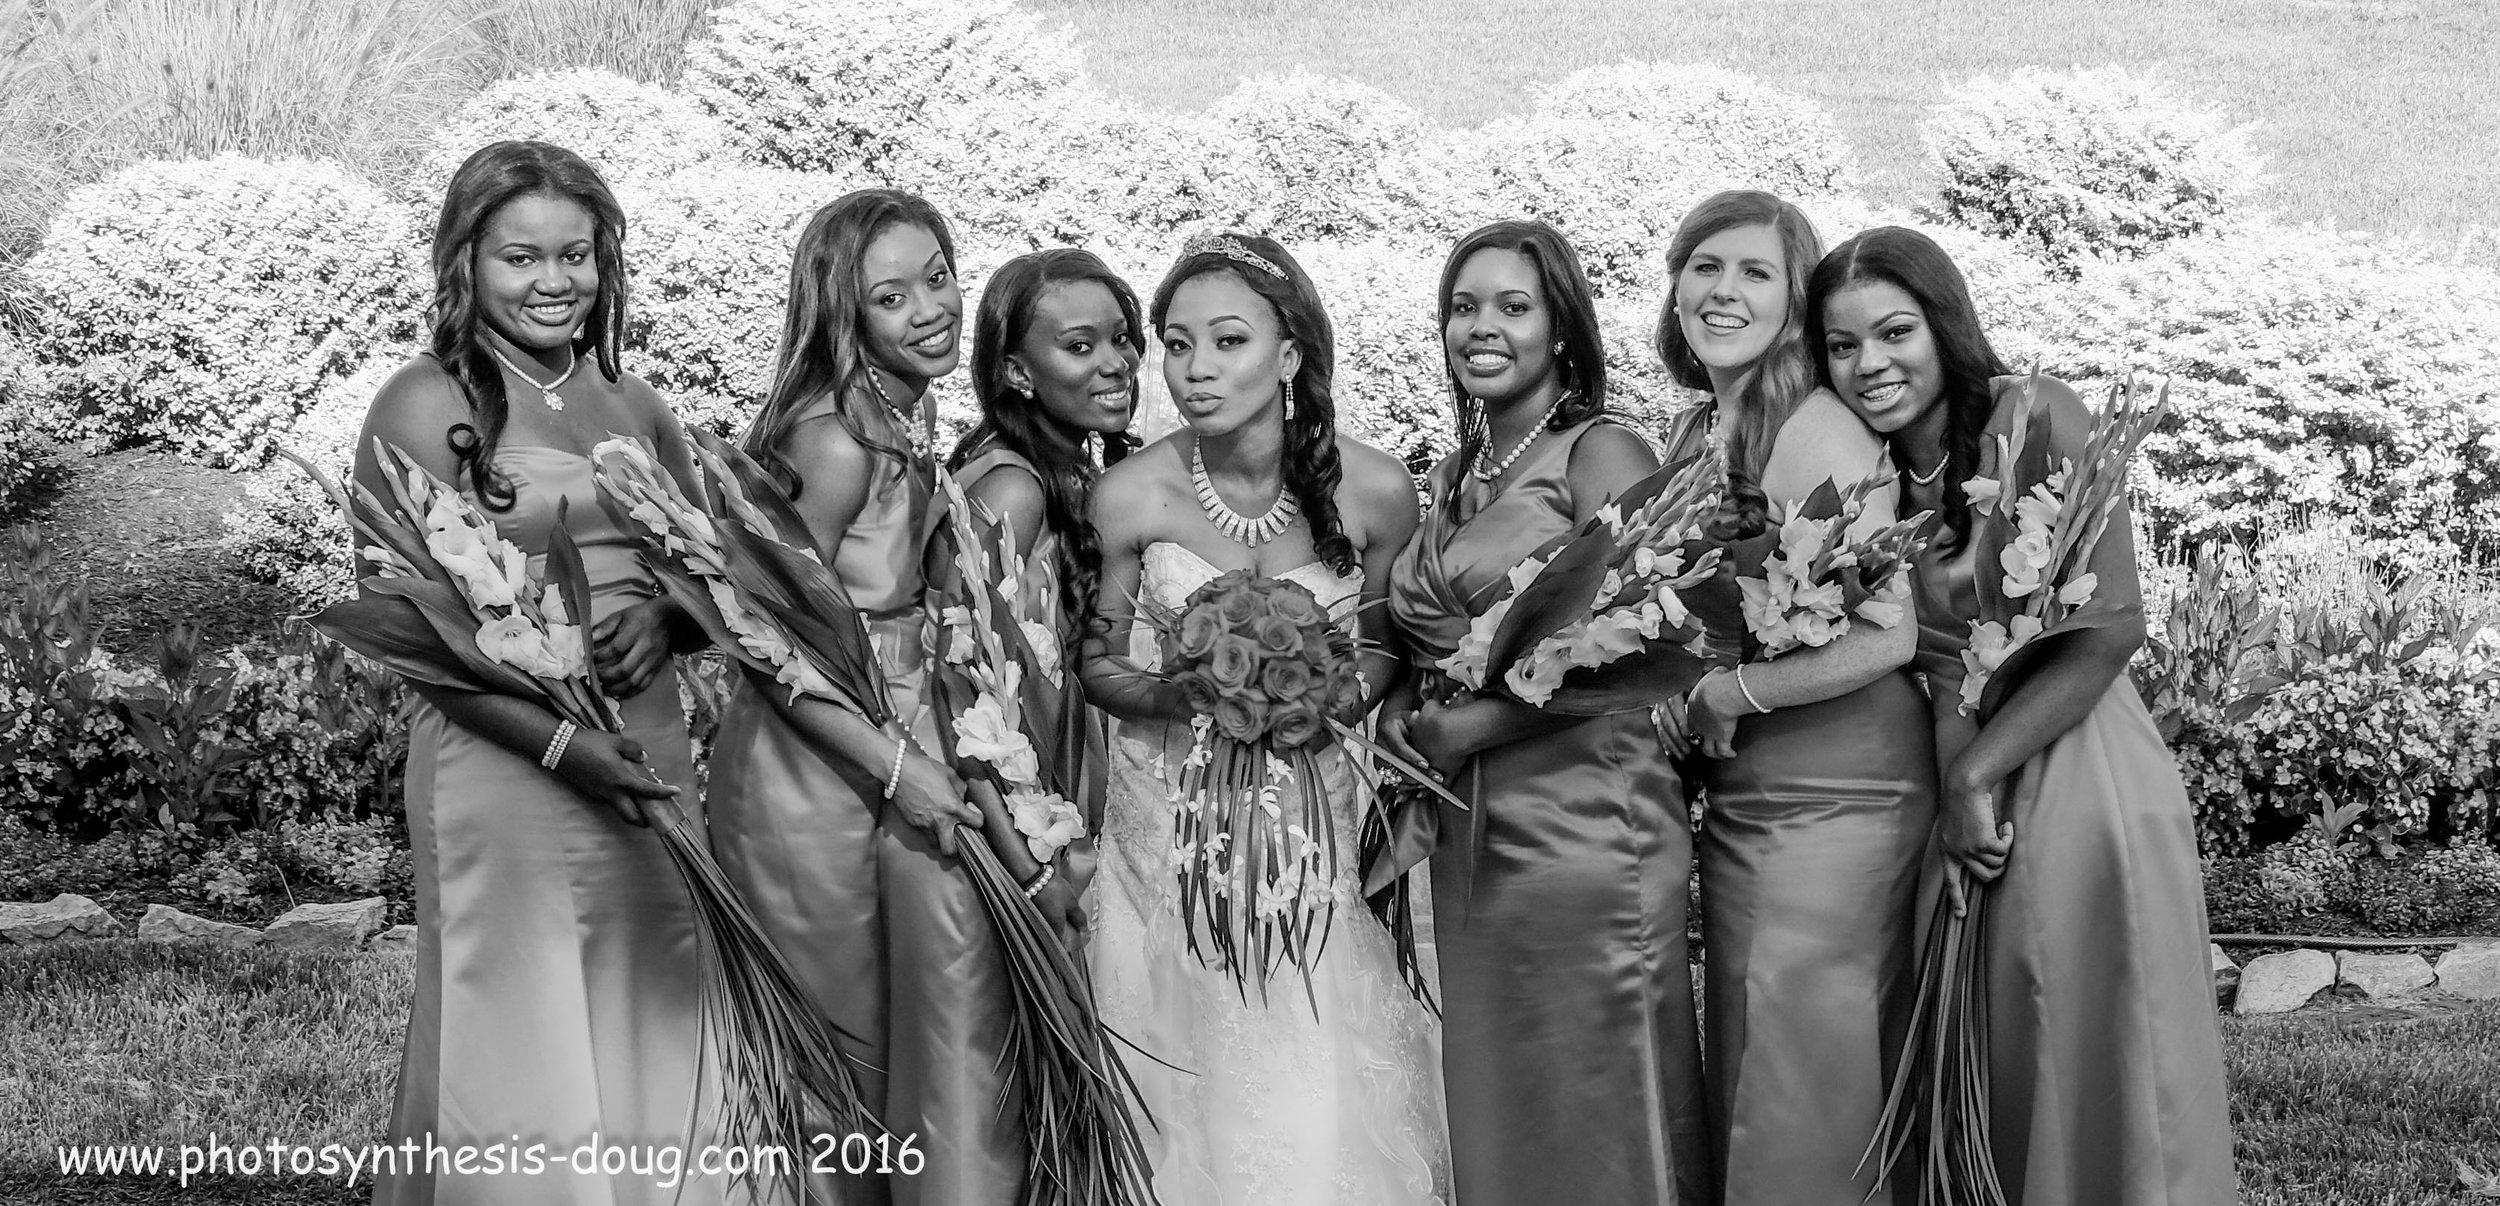 Brides by Doug-7869.jpg